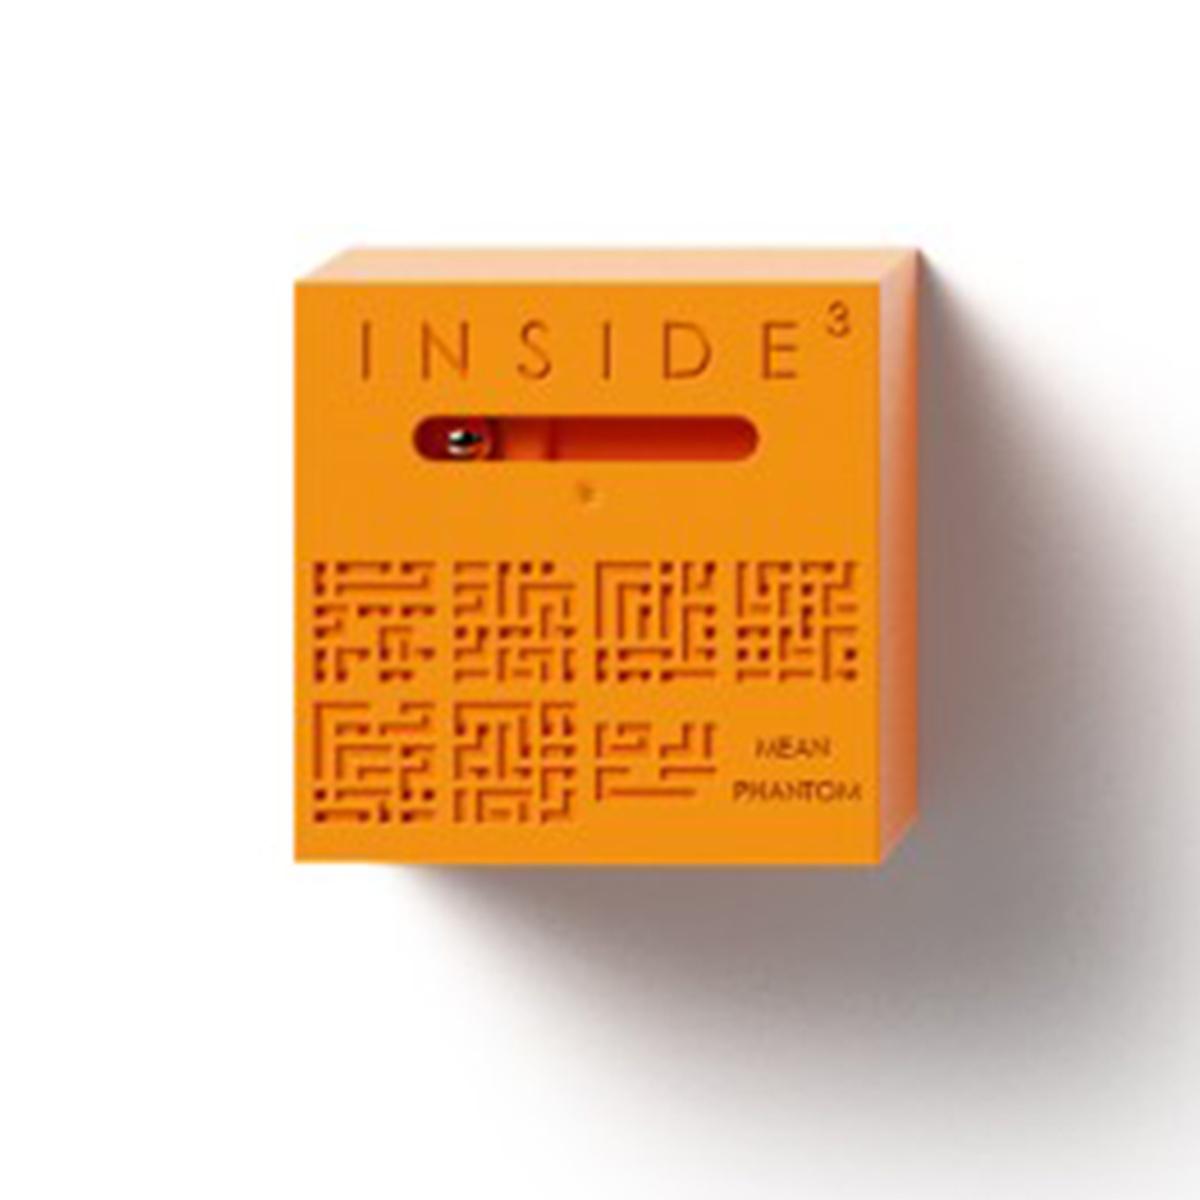 Inside Ze Cube Phantom - Orange - Avancé